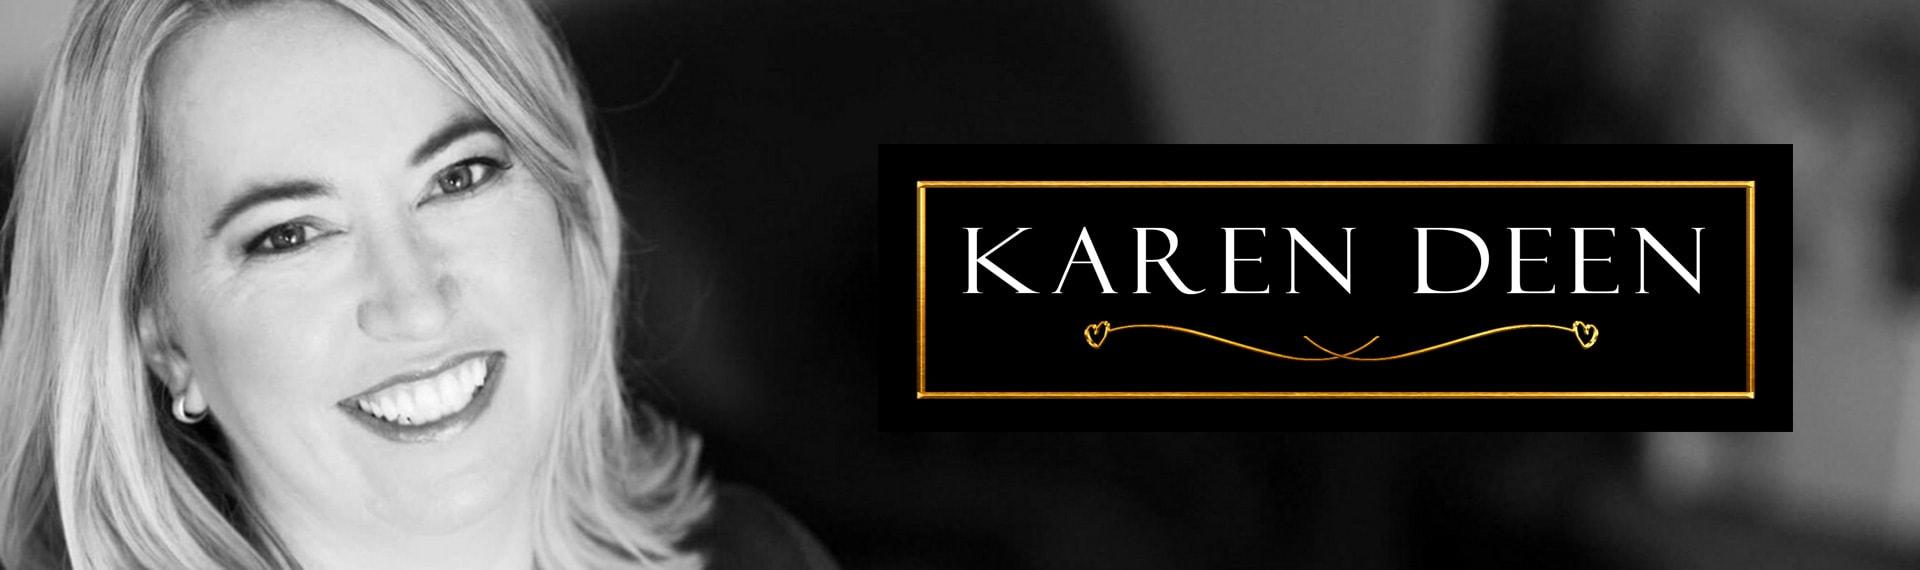 Karen Dean - Romance Author